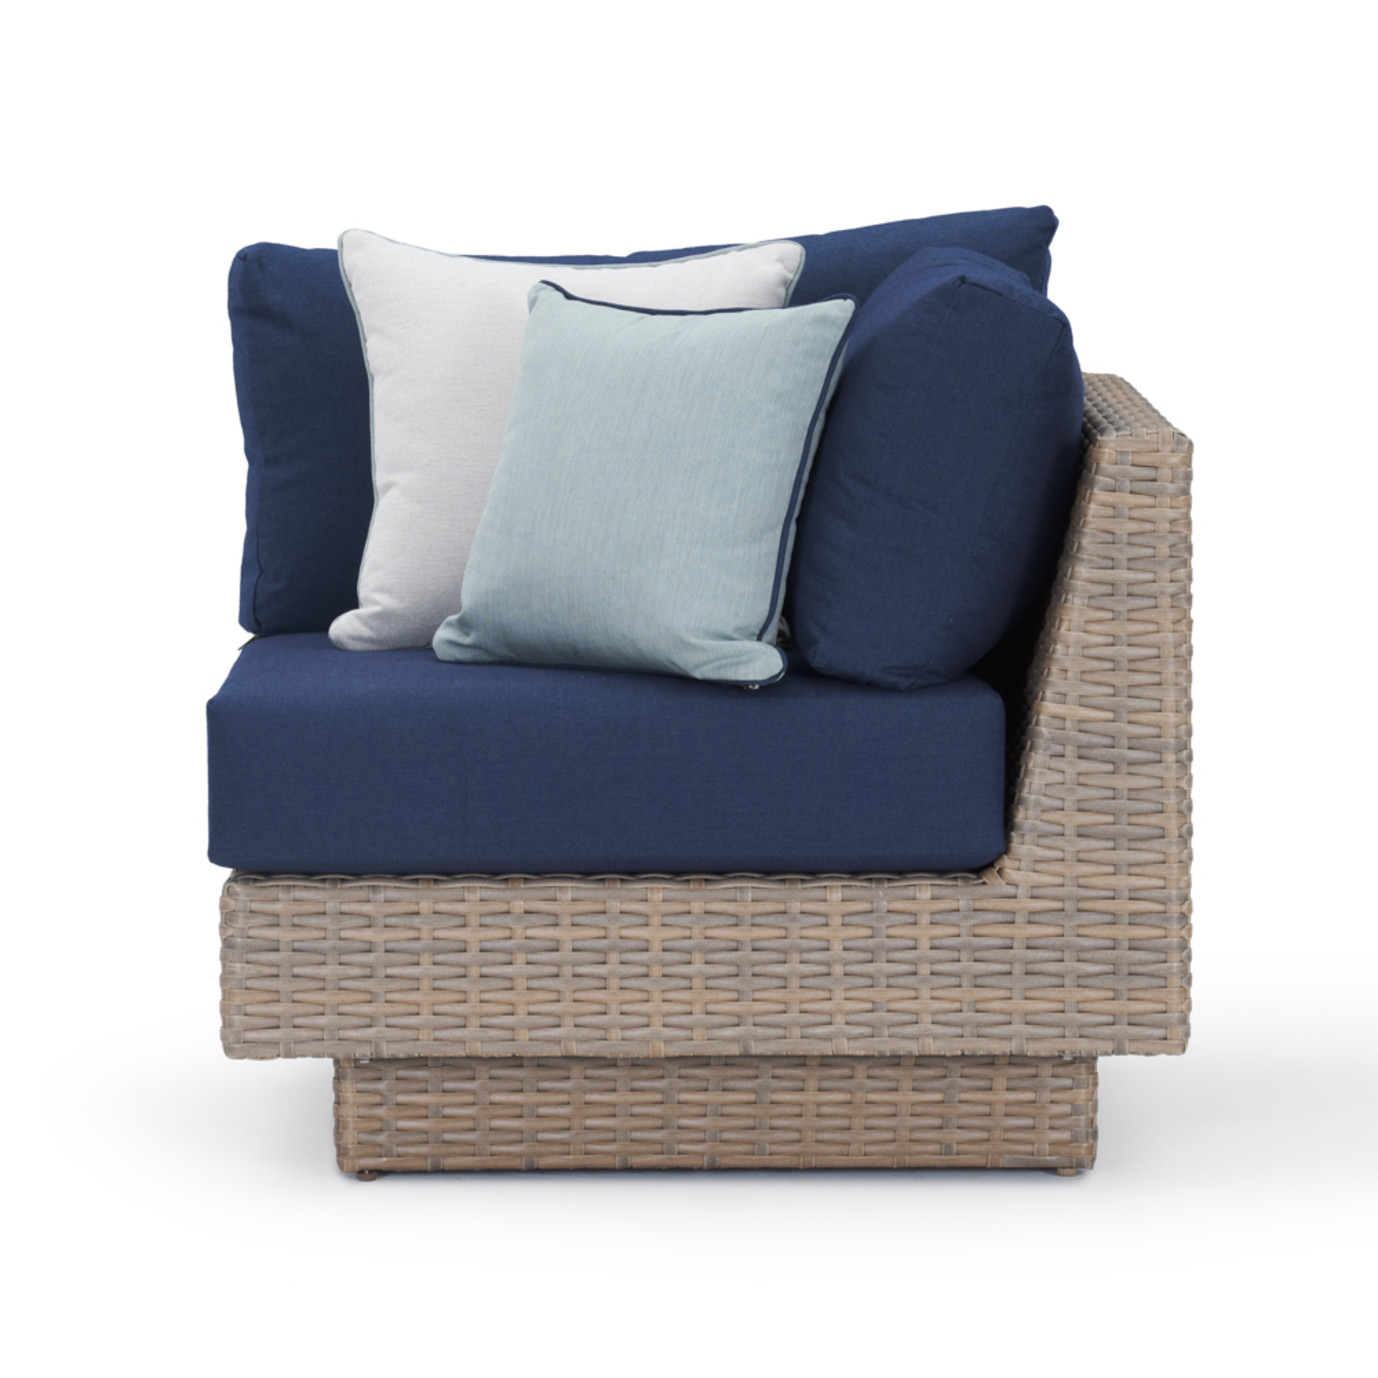 Portofino Repose Corner Chair - Laguna Blue